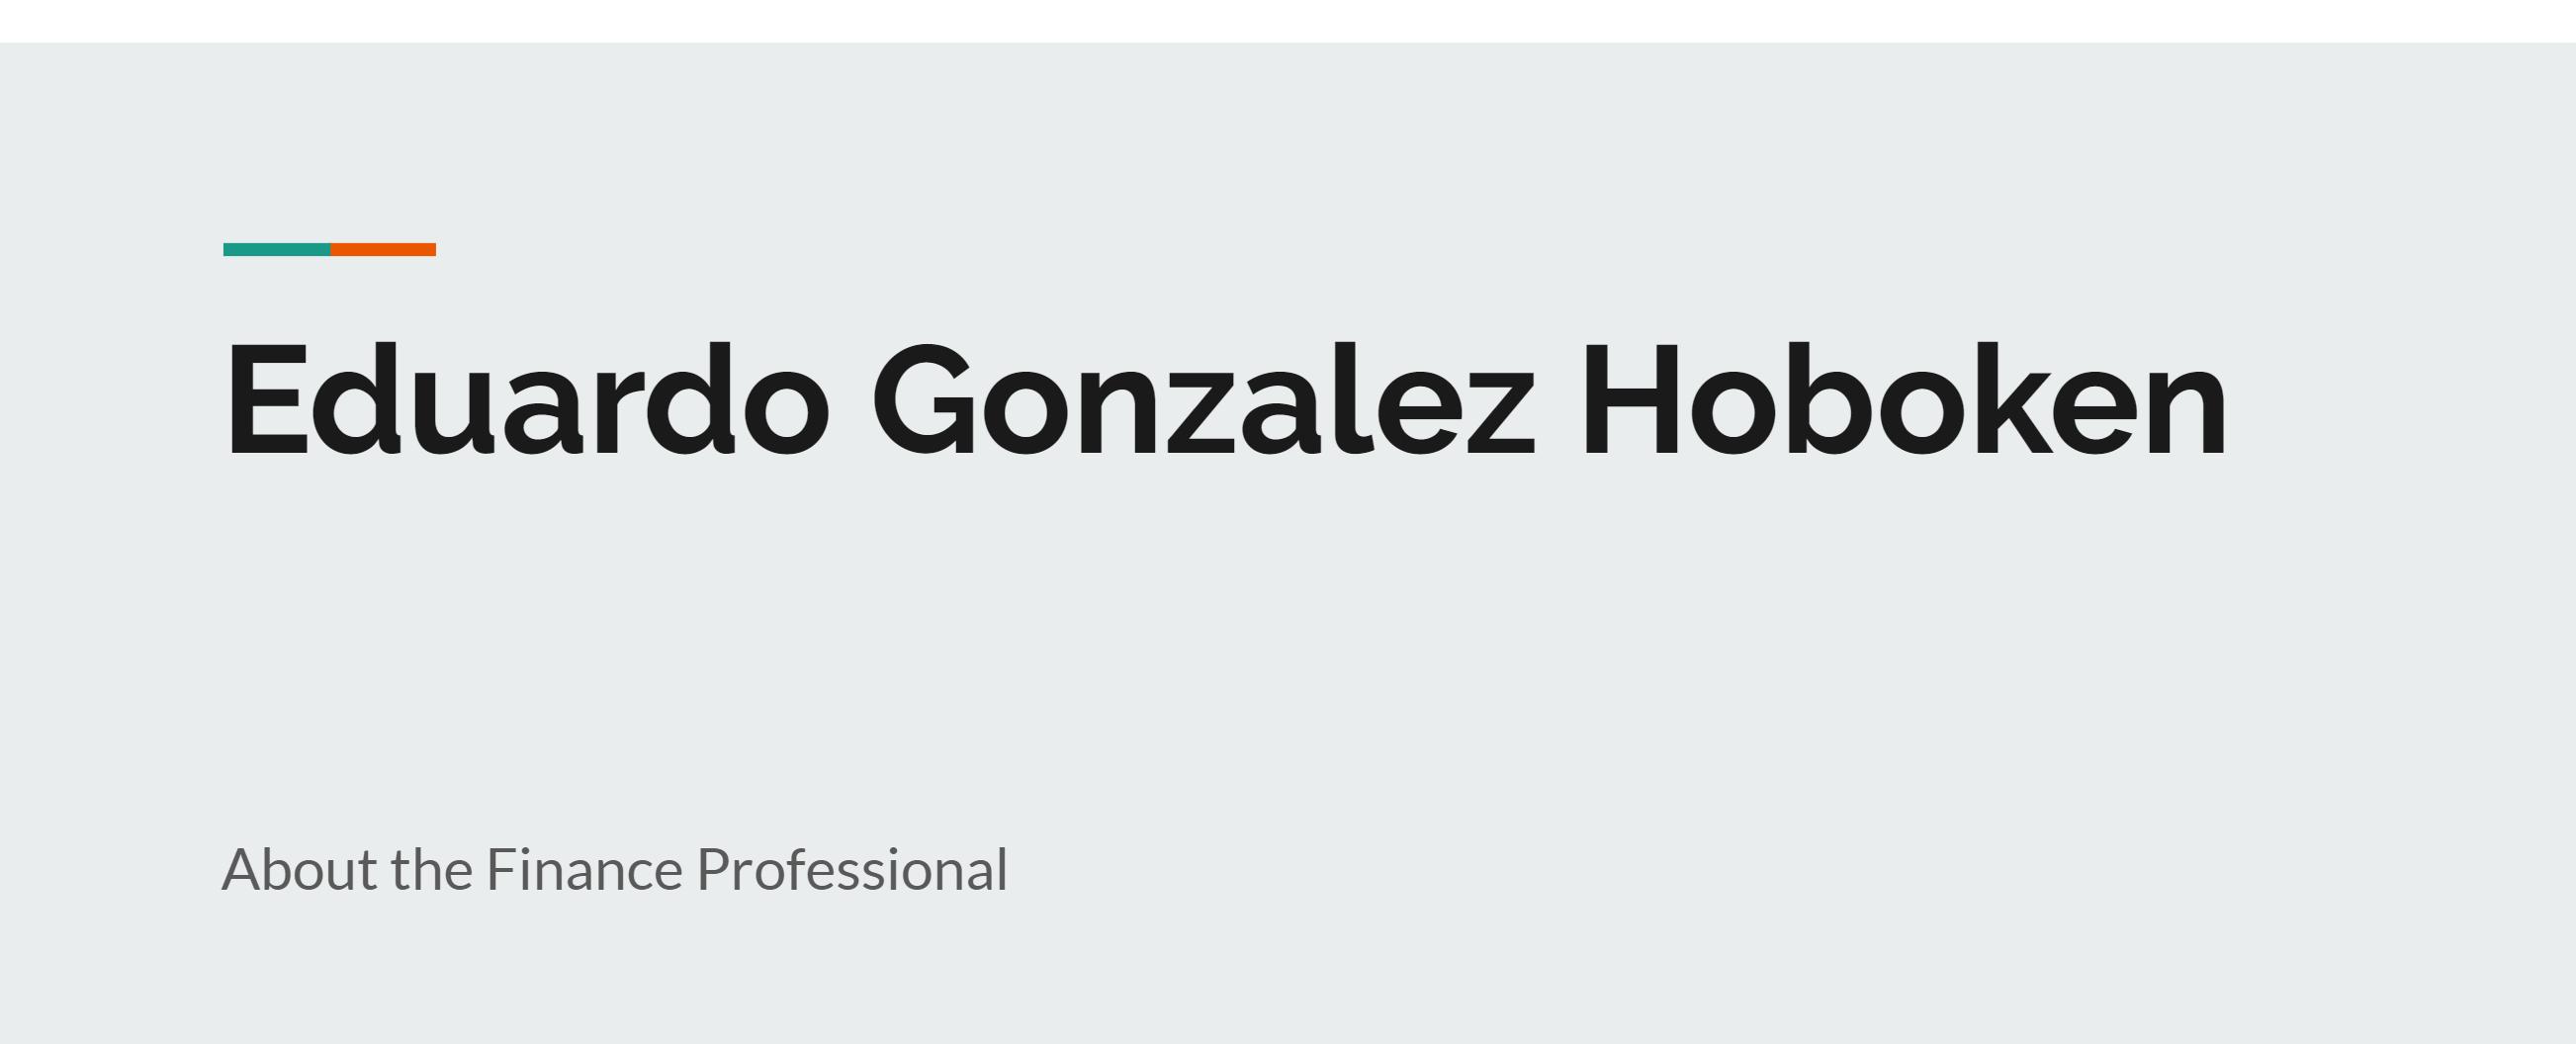 Hoboken Portfolio Manager Eduardo Gonzalez